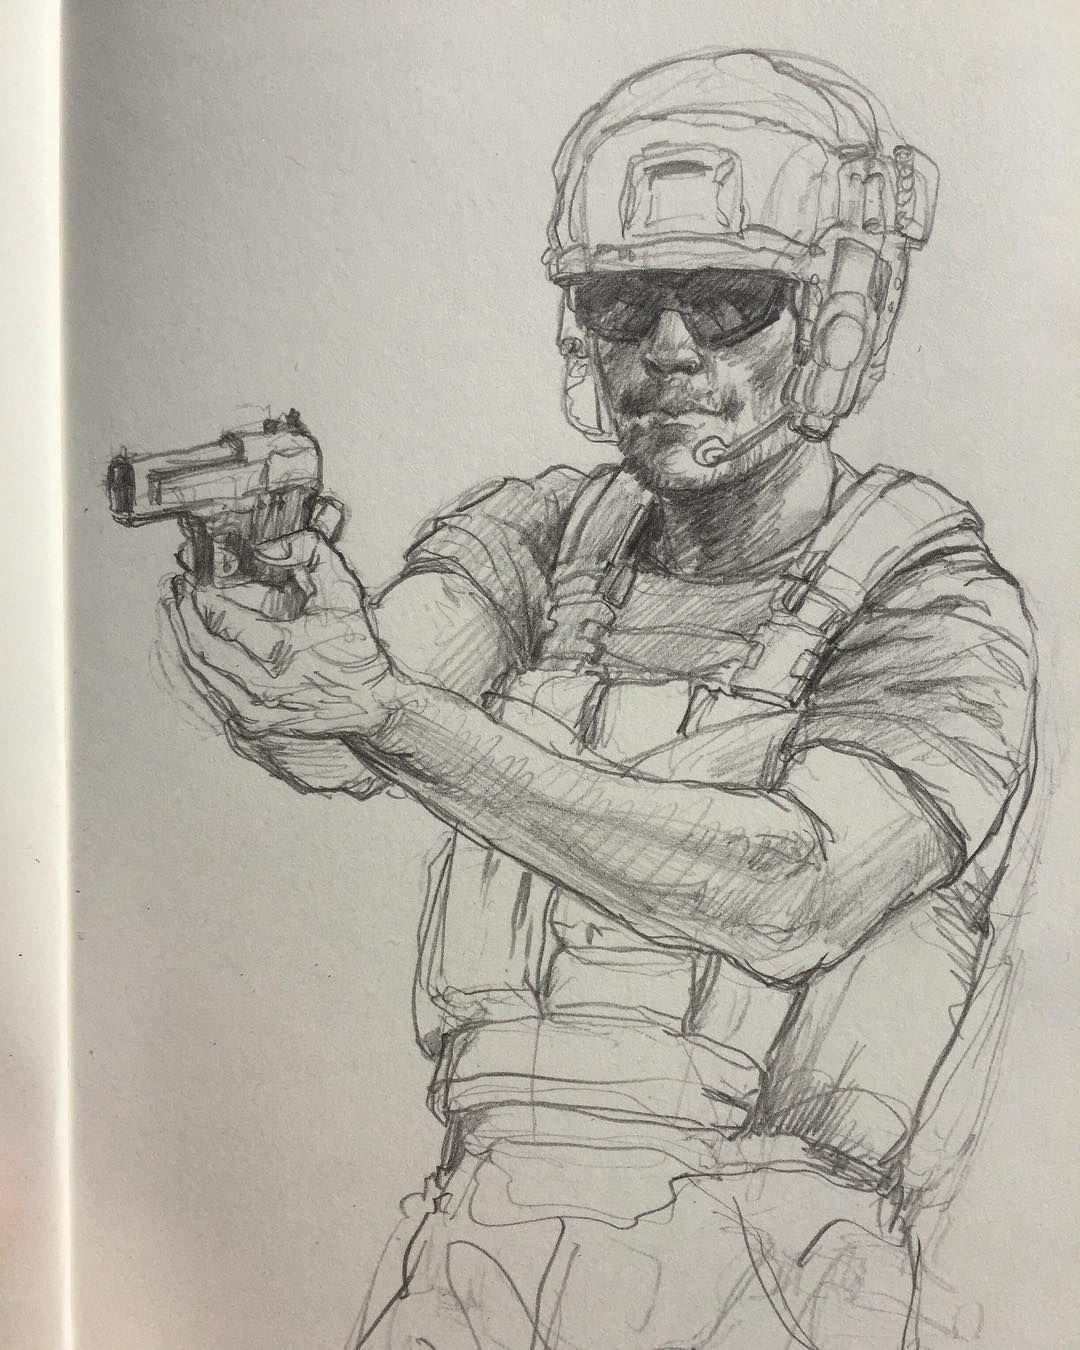 Soldier guns pistol sketch sketching sketchbook doodle drawing pencil pencilsketch pencildrawing art